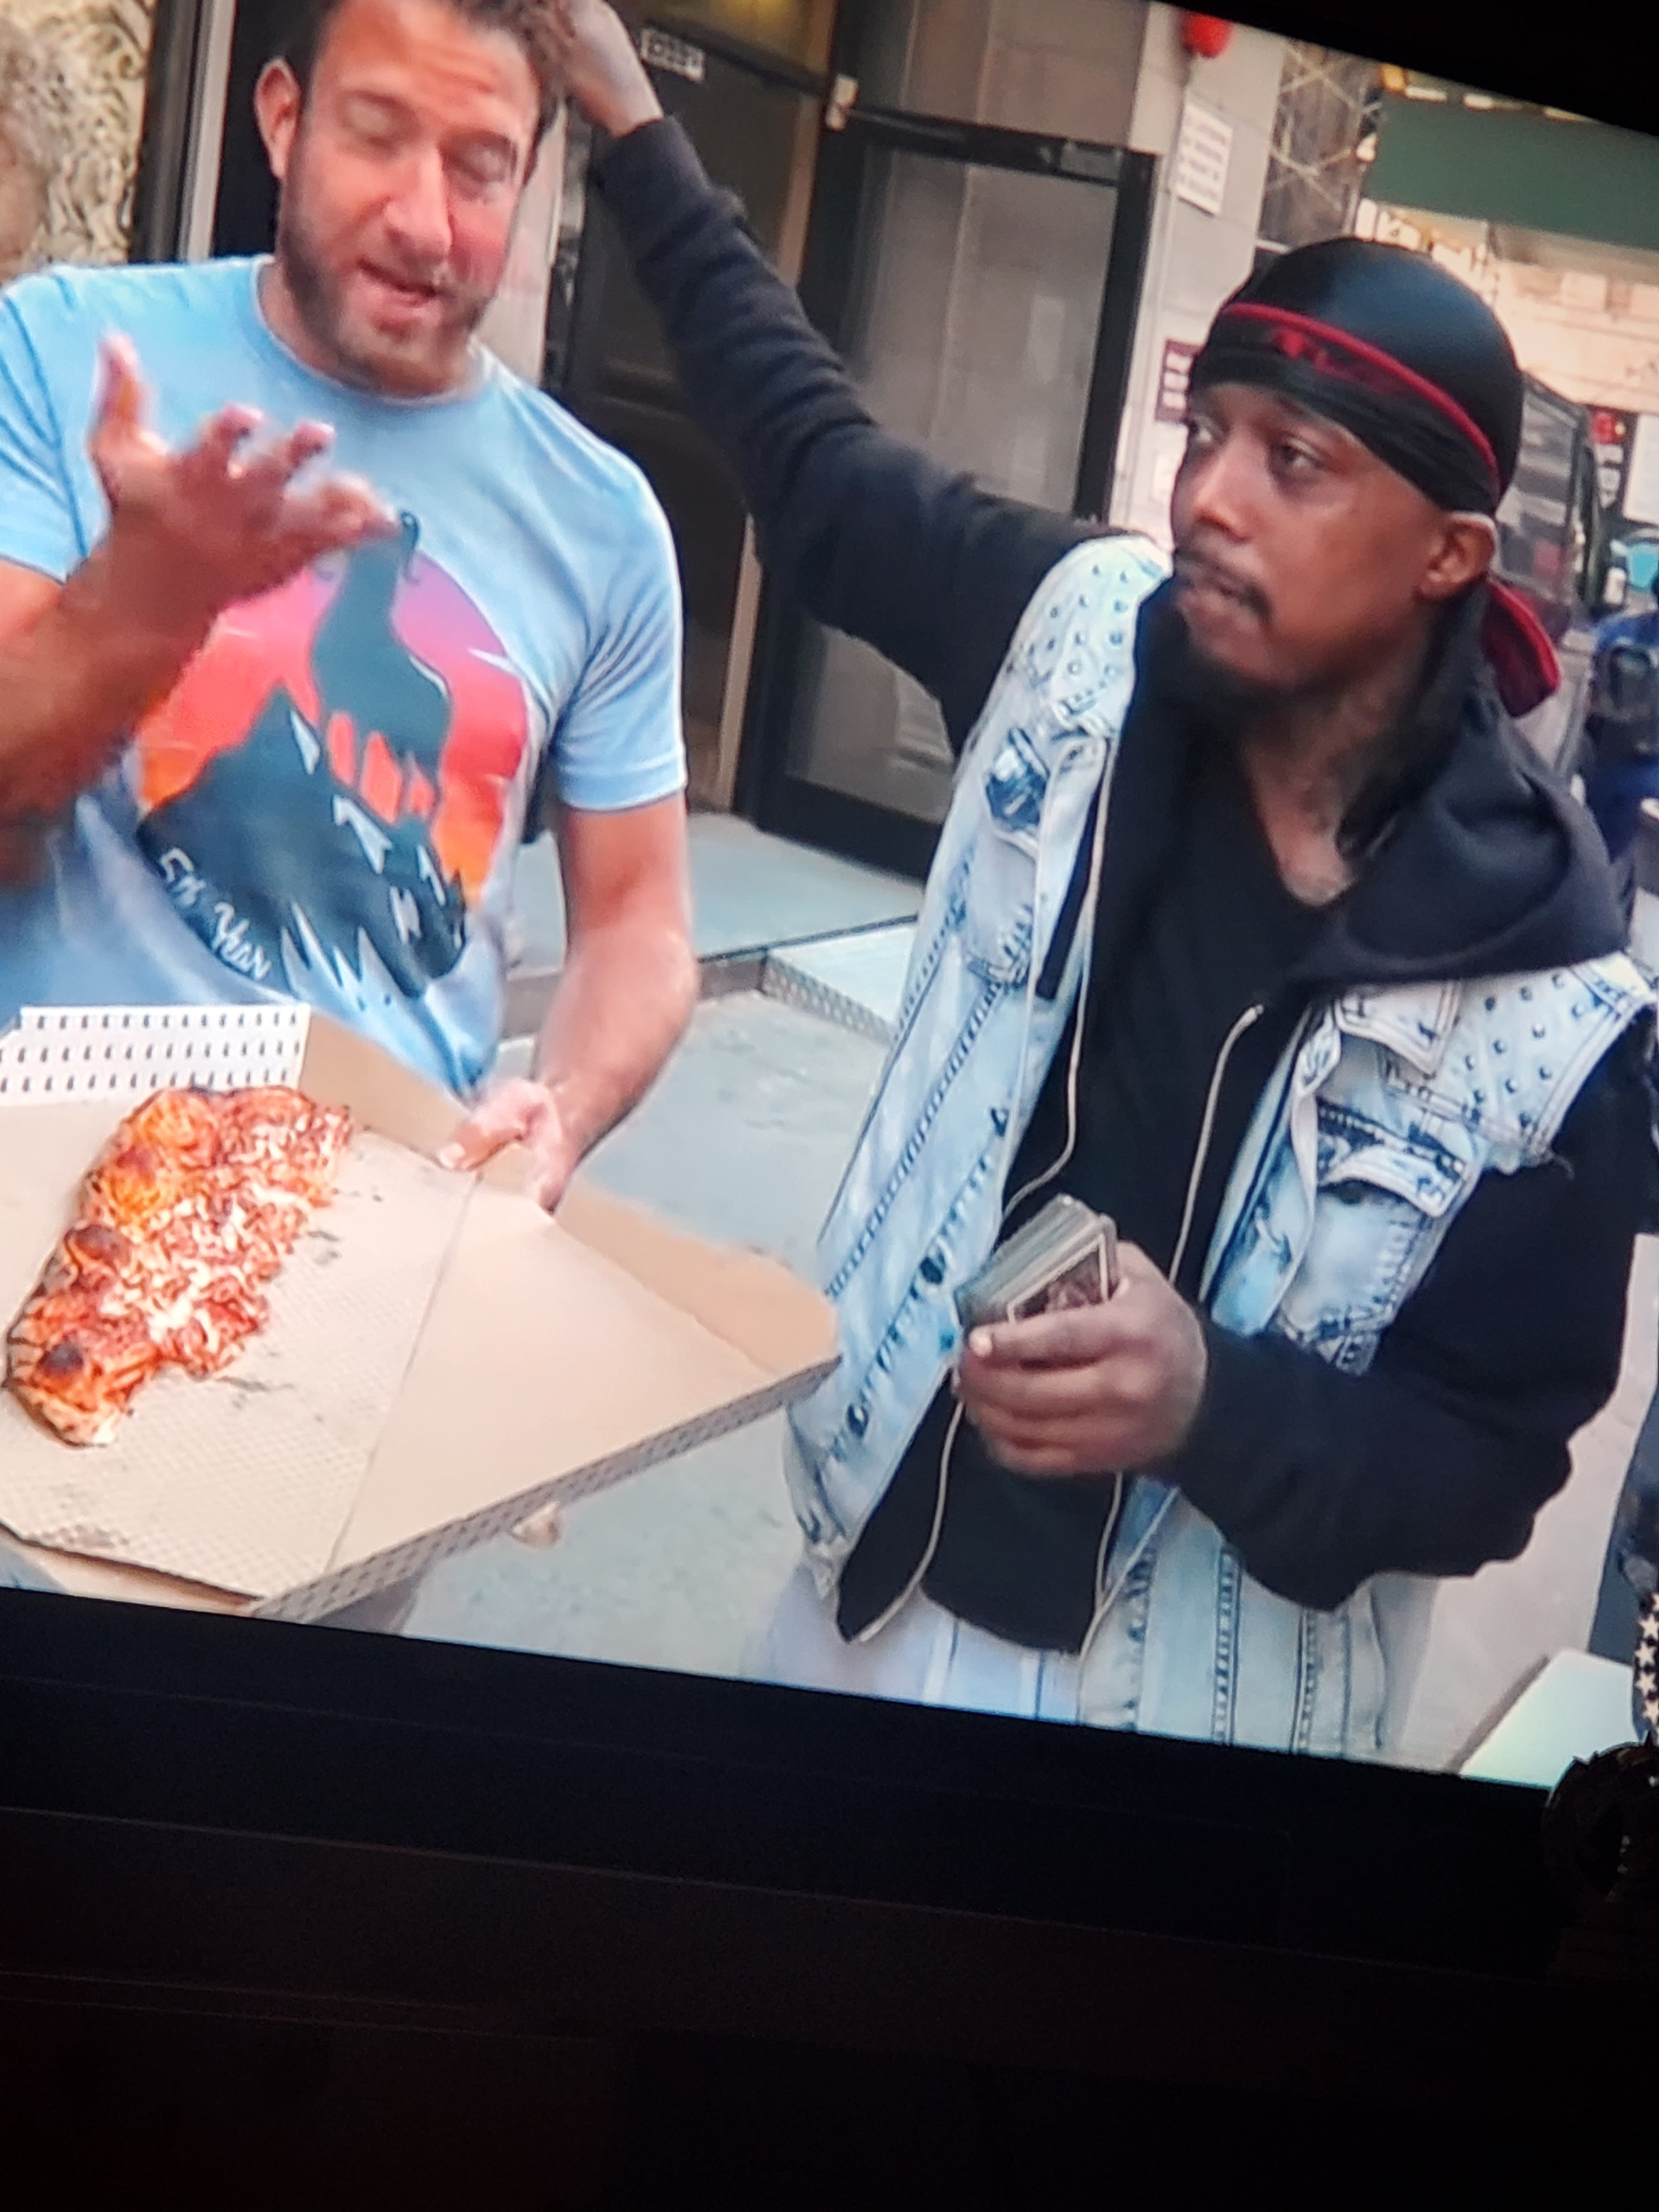 jason.thompson11 on One Bite Pizza App